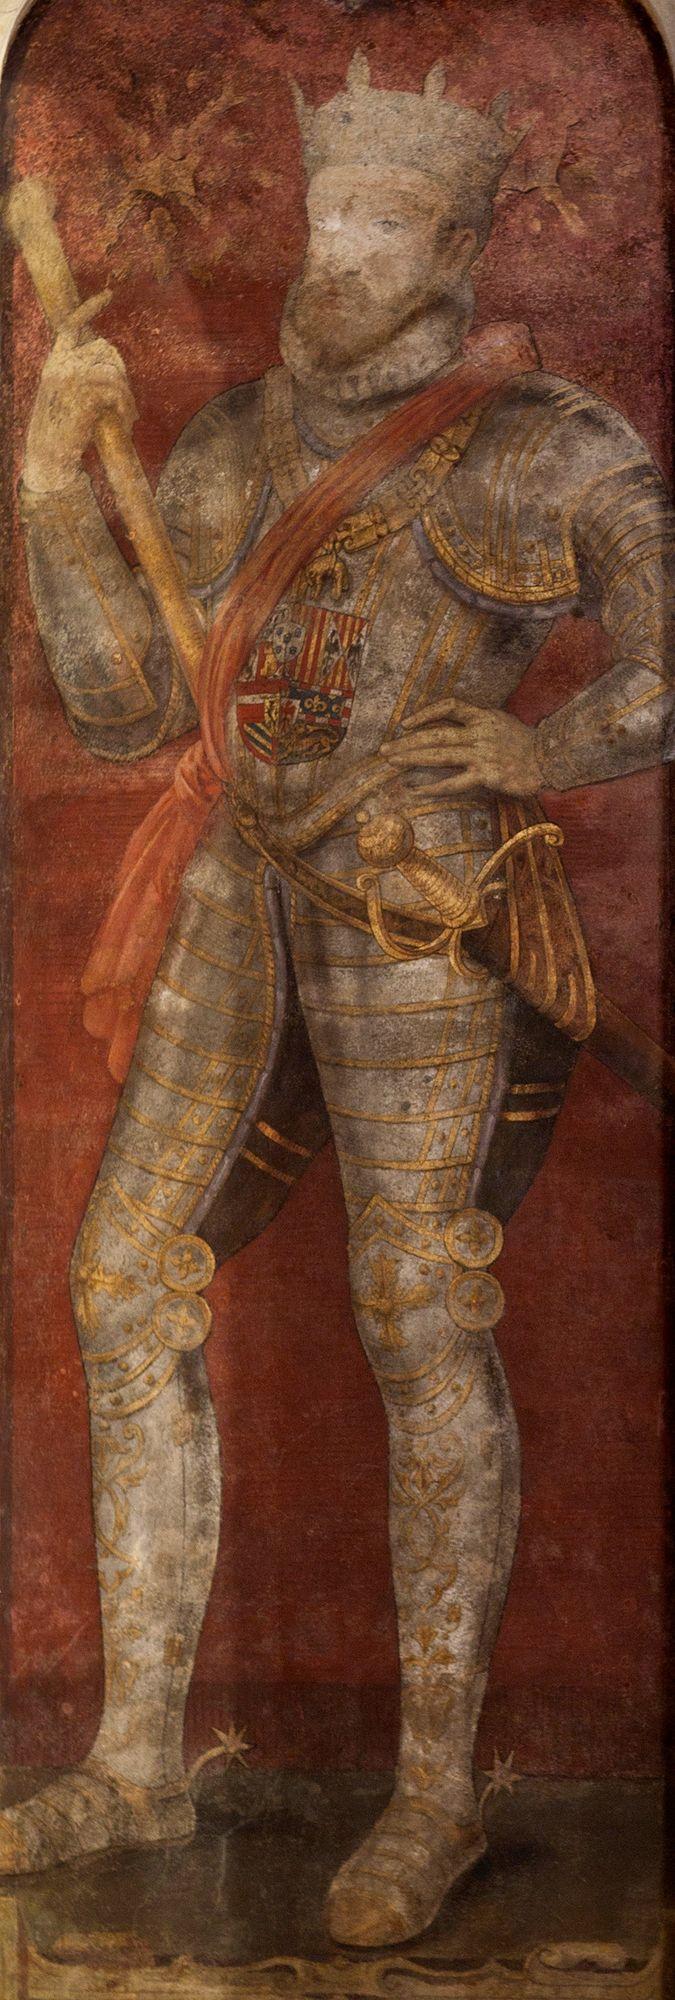 1555 - 1598 Filips II